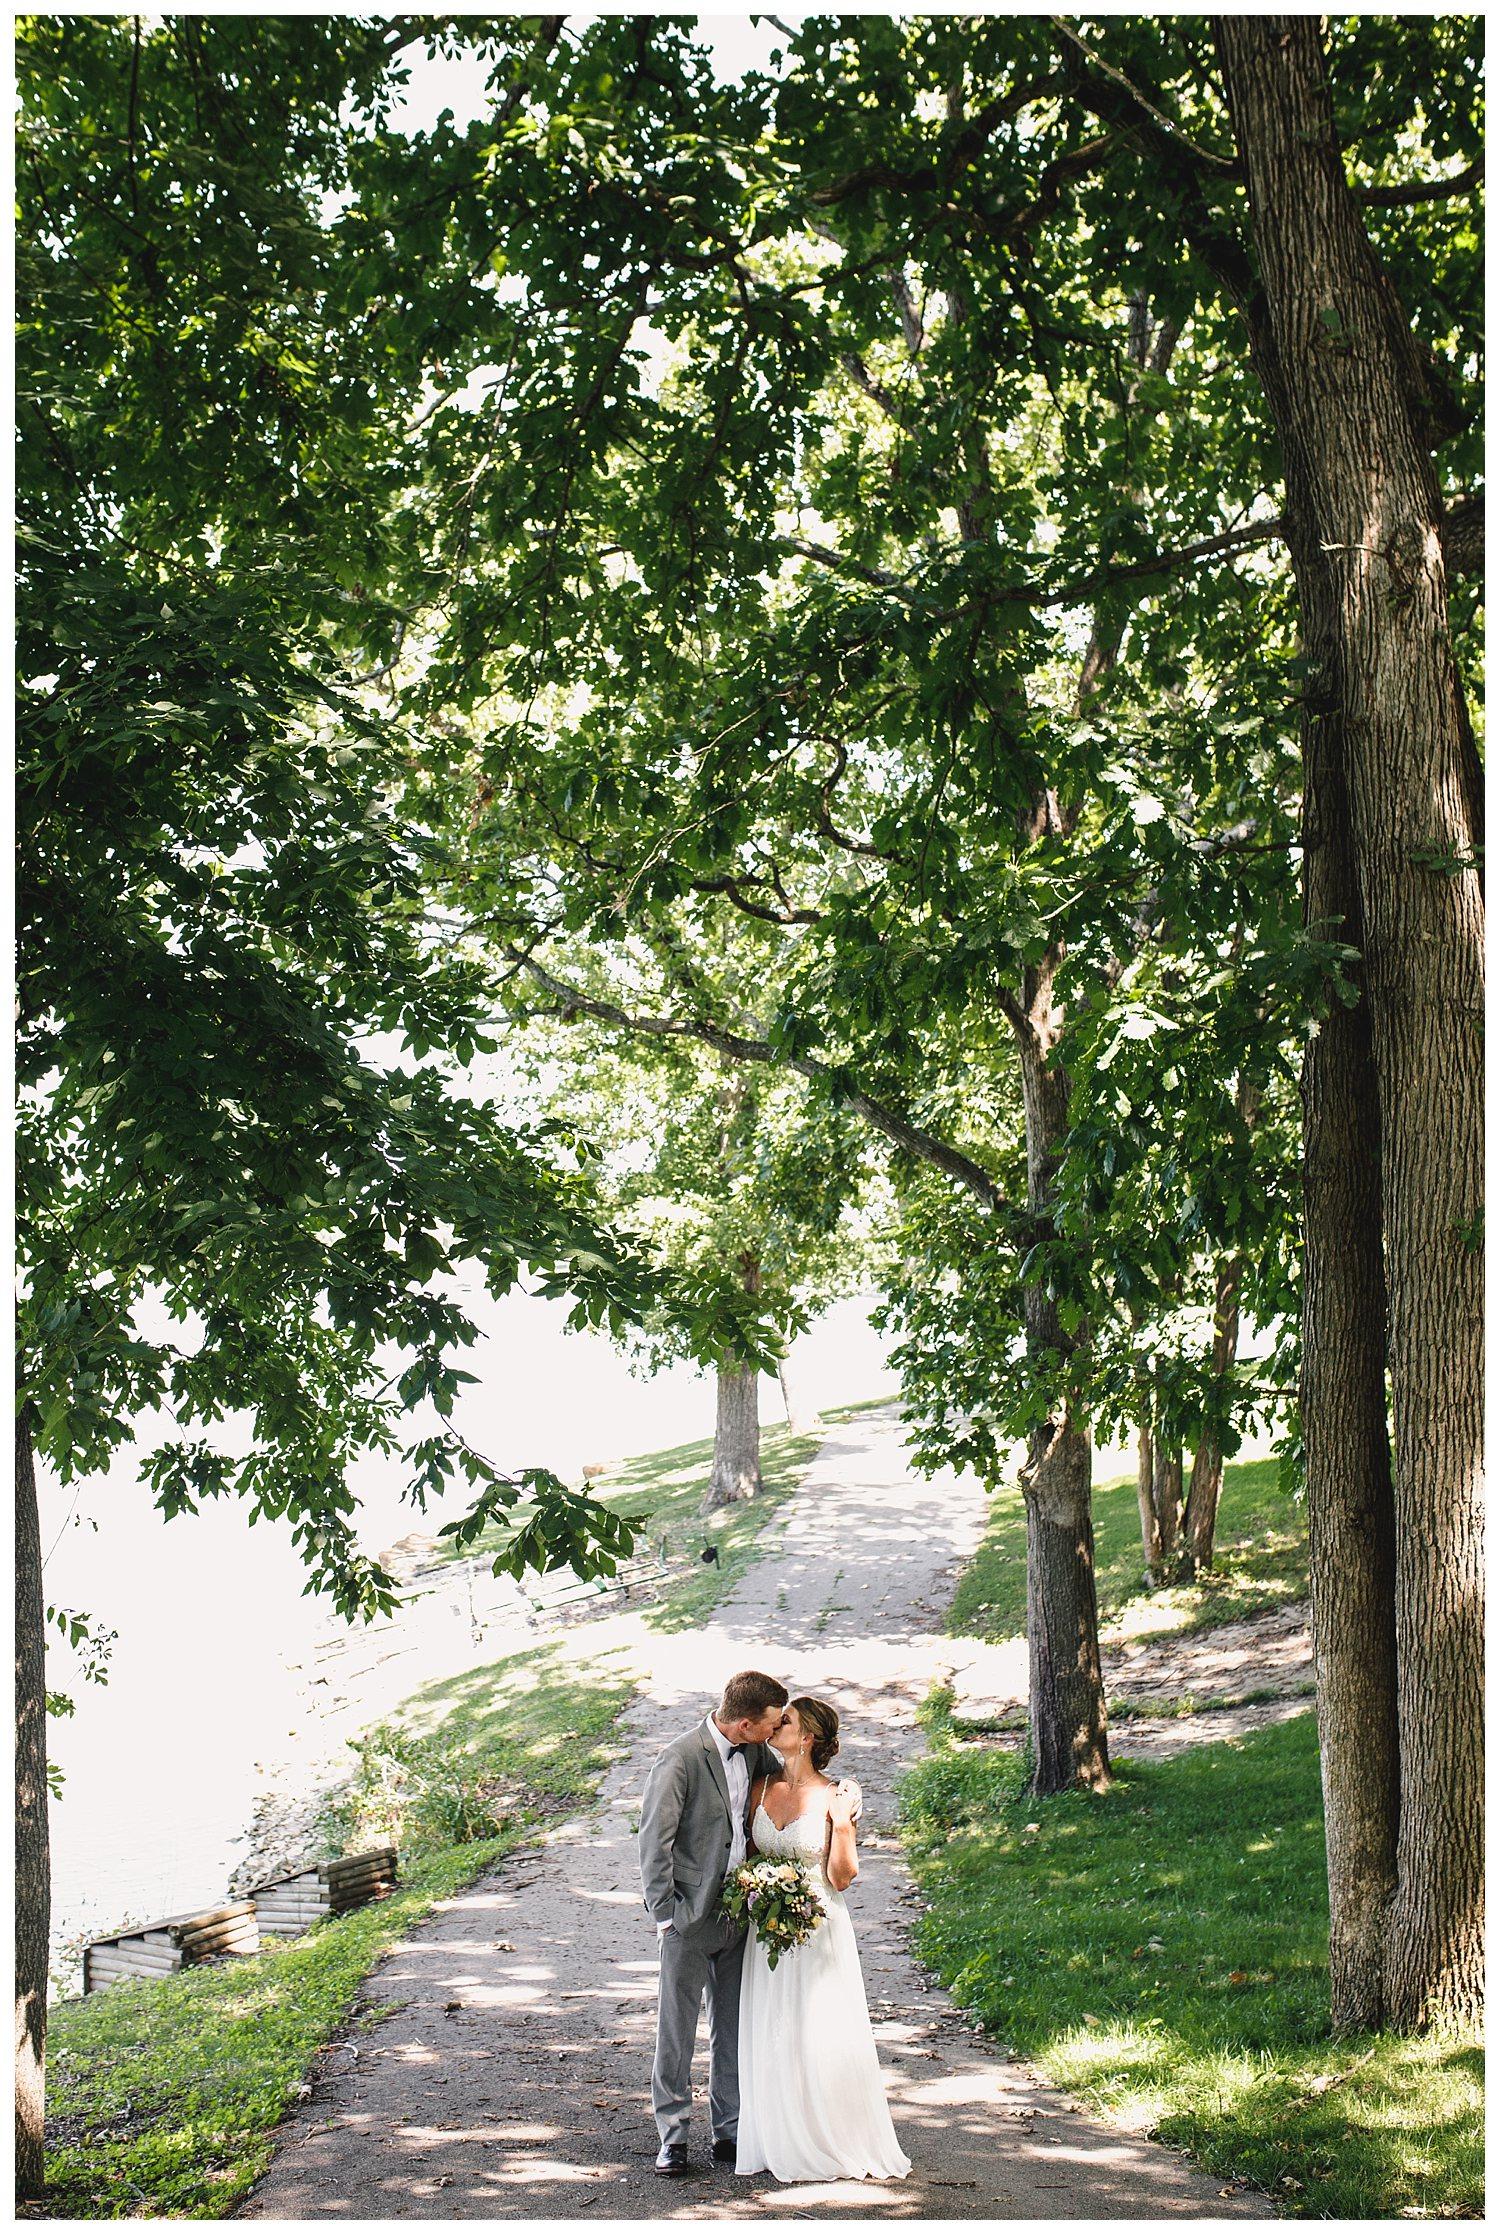 Kelsey_Diane_Photography_Kansas_City_Engagement_Wedding_Photographer_Midwest_Traveling_Missouri_Lee_Andrew_Hall_And_Garden_Blue_Springs_Wedding_Clayton_Kimberly_Summer_Wedding_0825.jpg